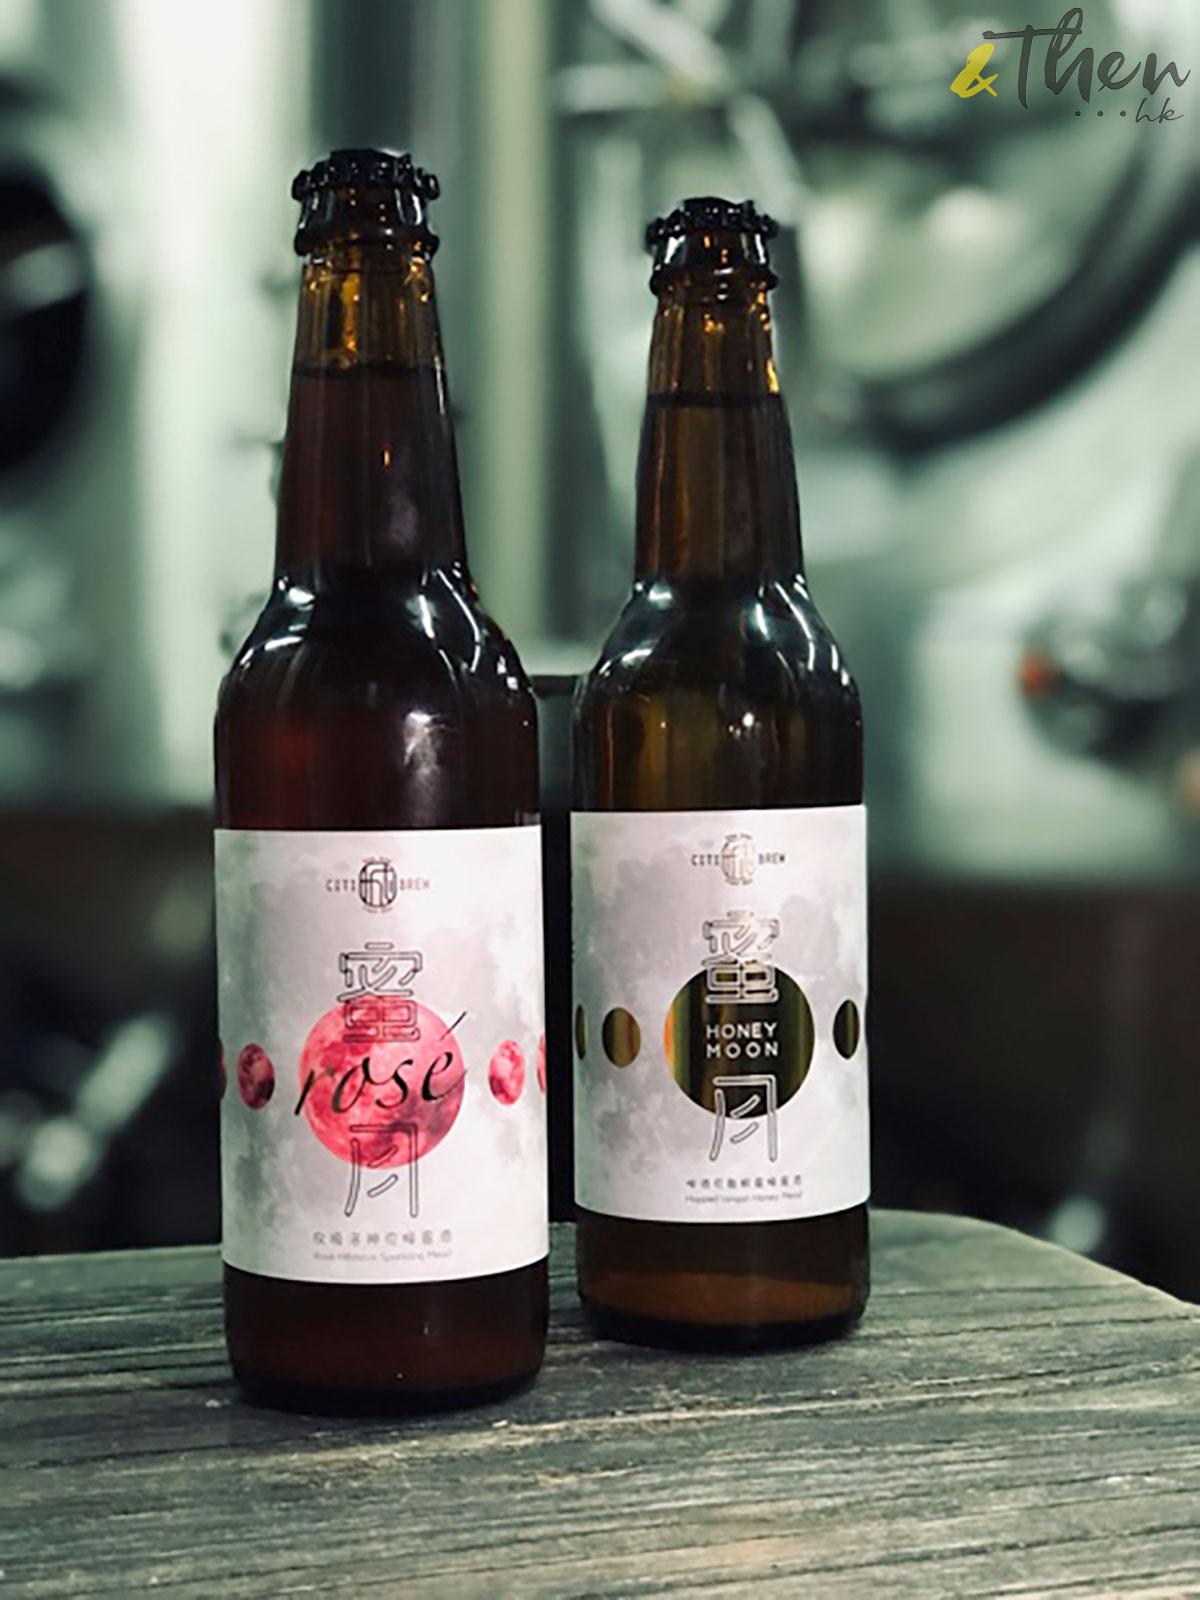 Citibrew 城釀 手工啤 啤酒廠 啤酒樽 香港品牌 香港人 蜜月 有汽蜂蜜酒